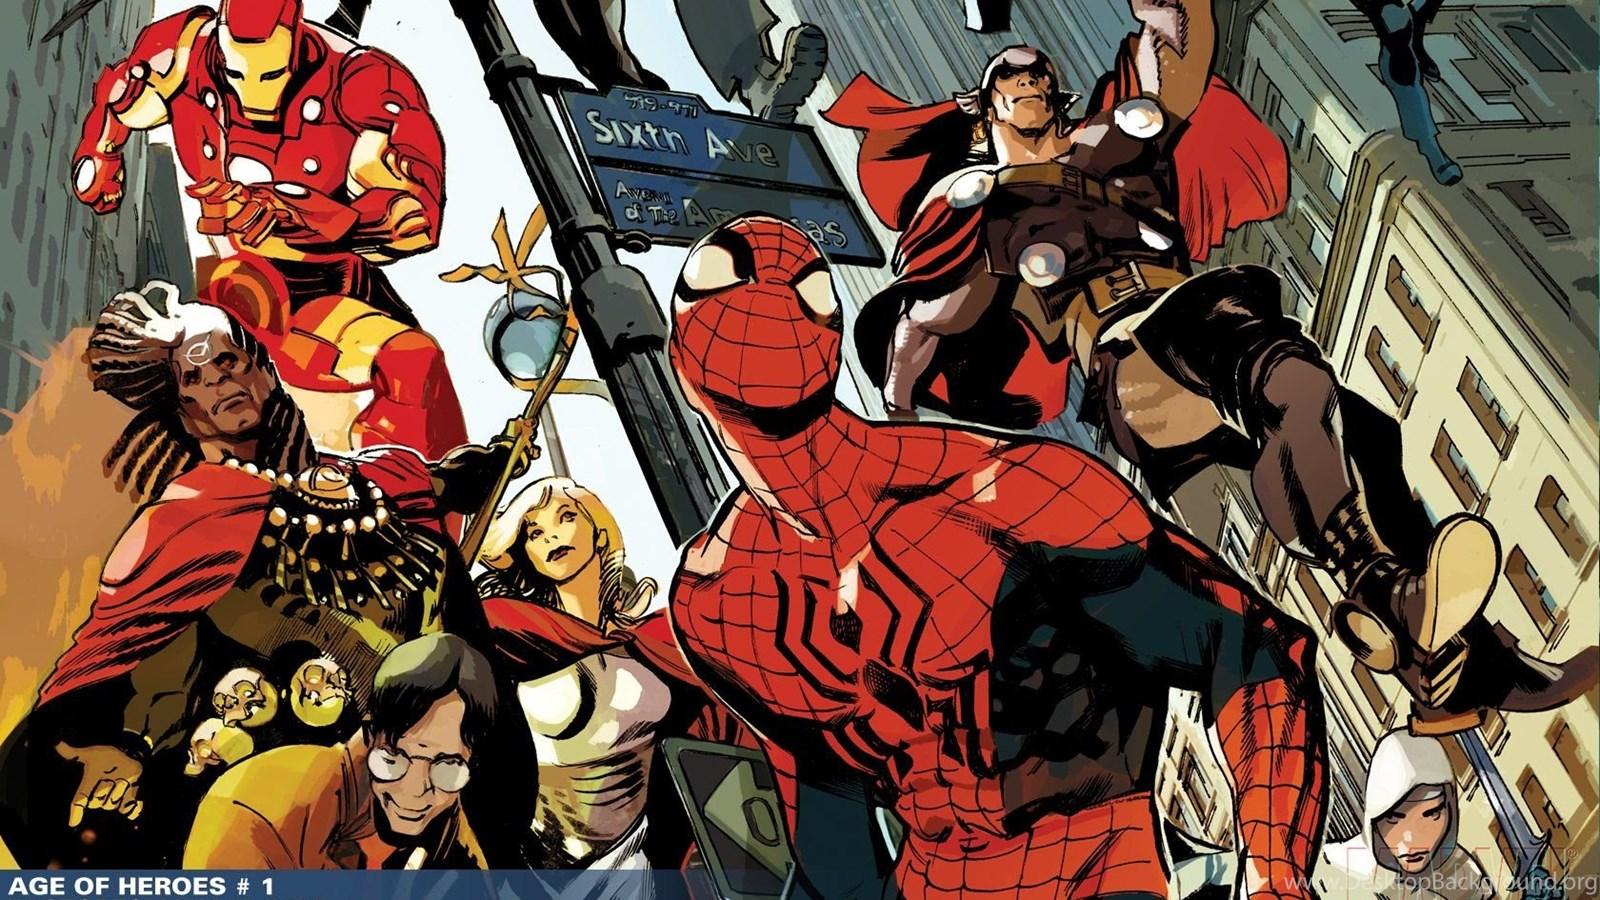 Iron man thor spider man marvel comics wallpapers desktop - Spiderman and ironman wallpaper ...